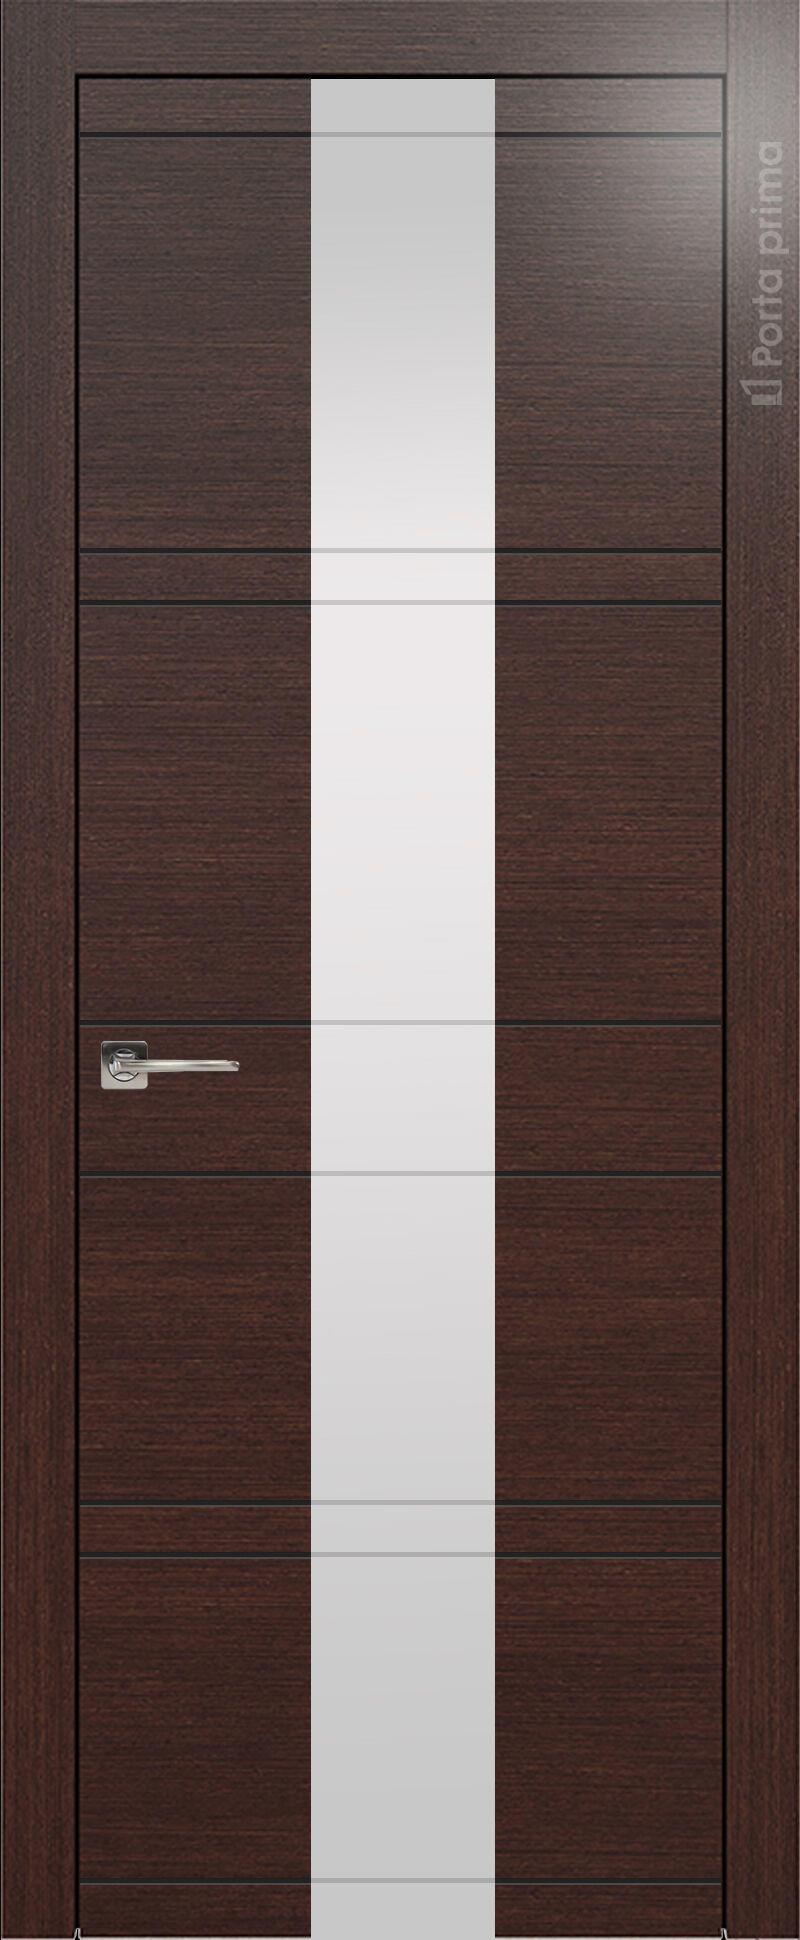 Tivoli Ж-2 цвет - Венге Со стеклом (ДО)